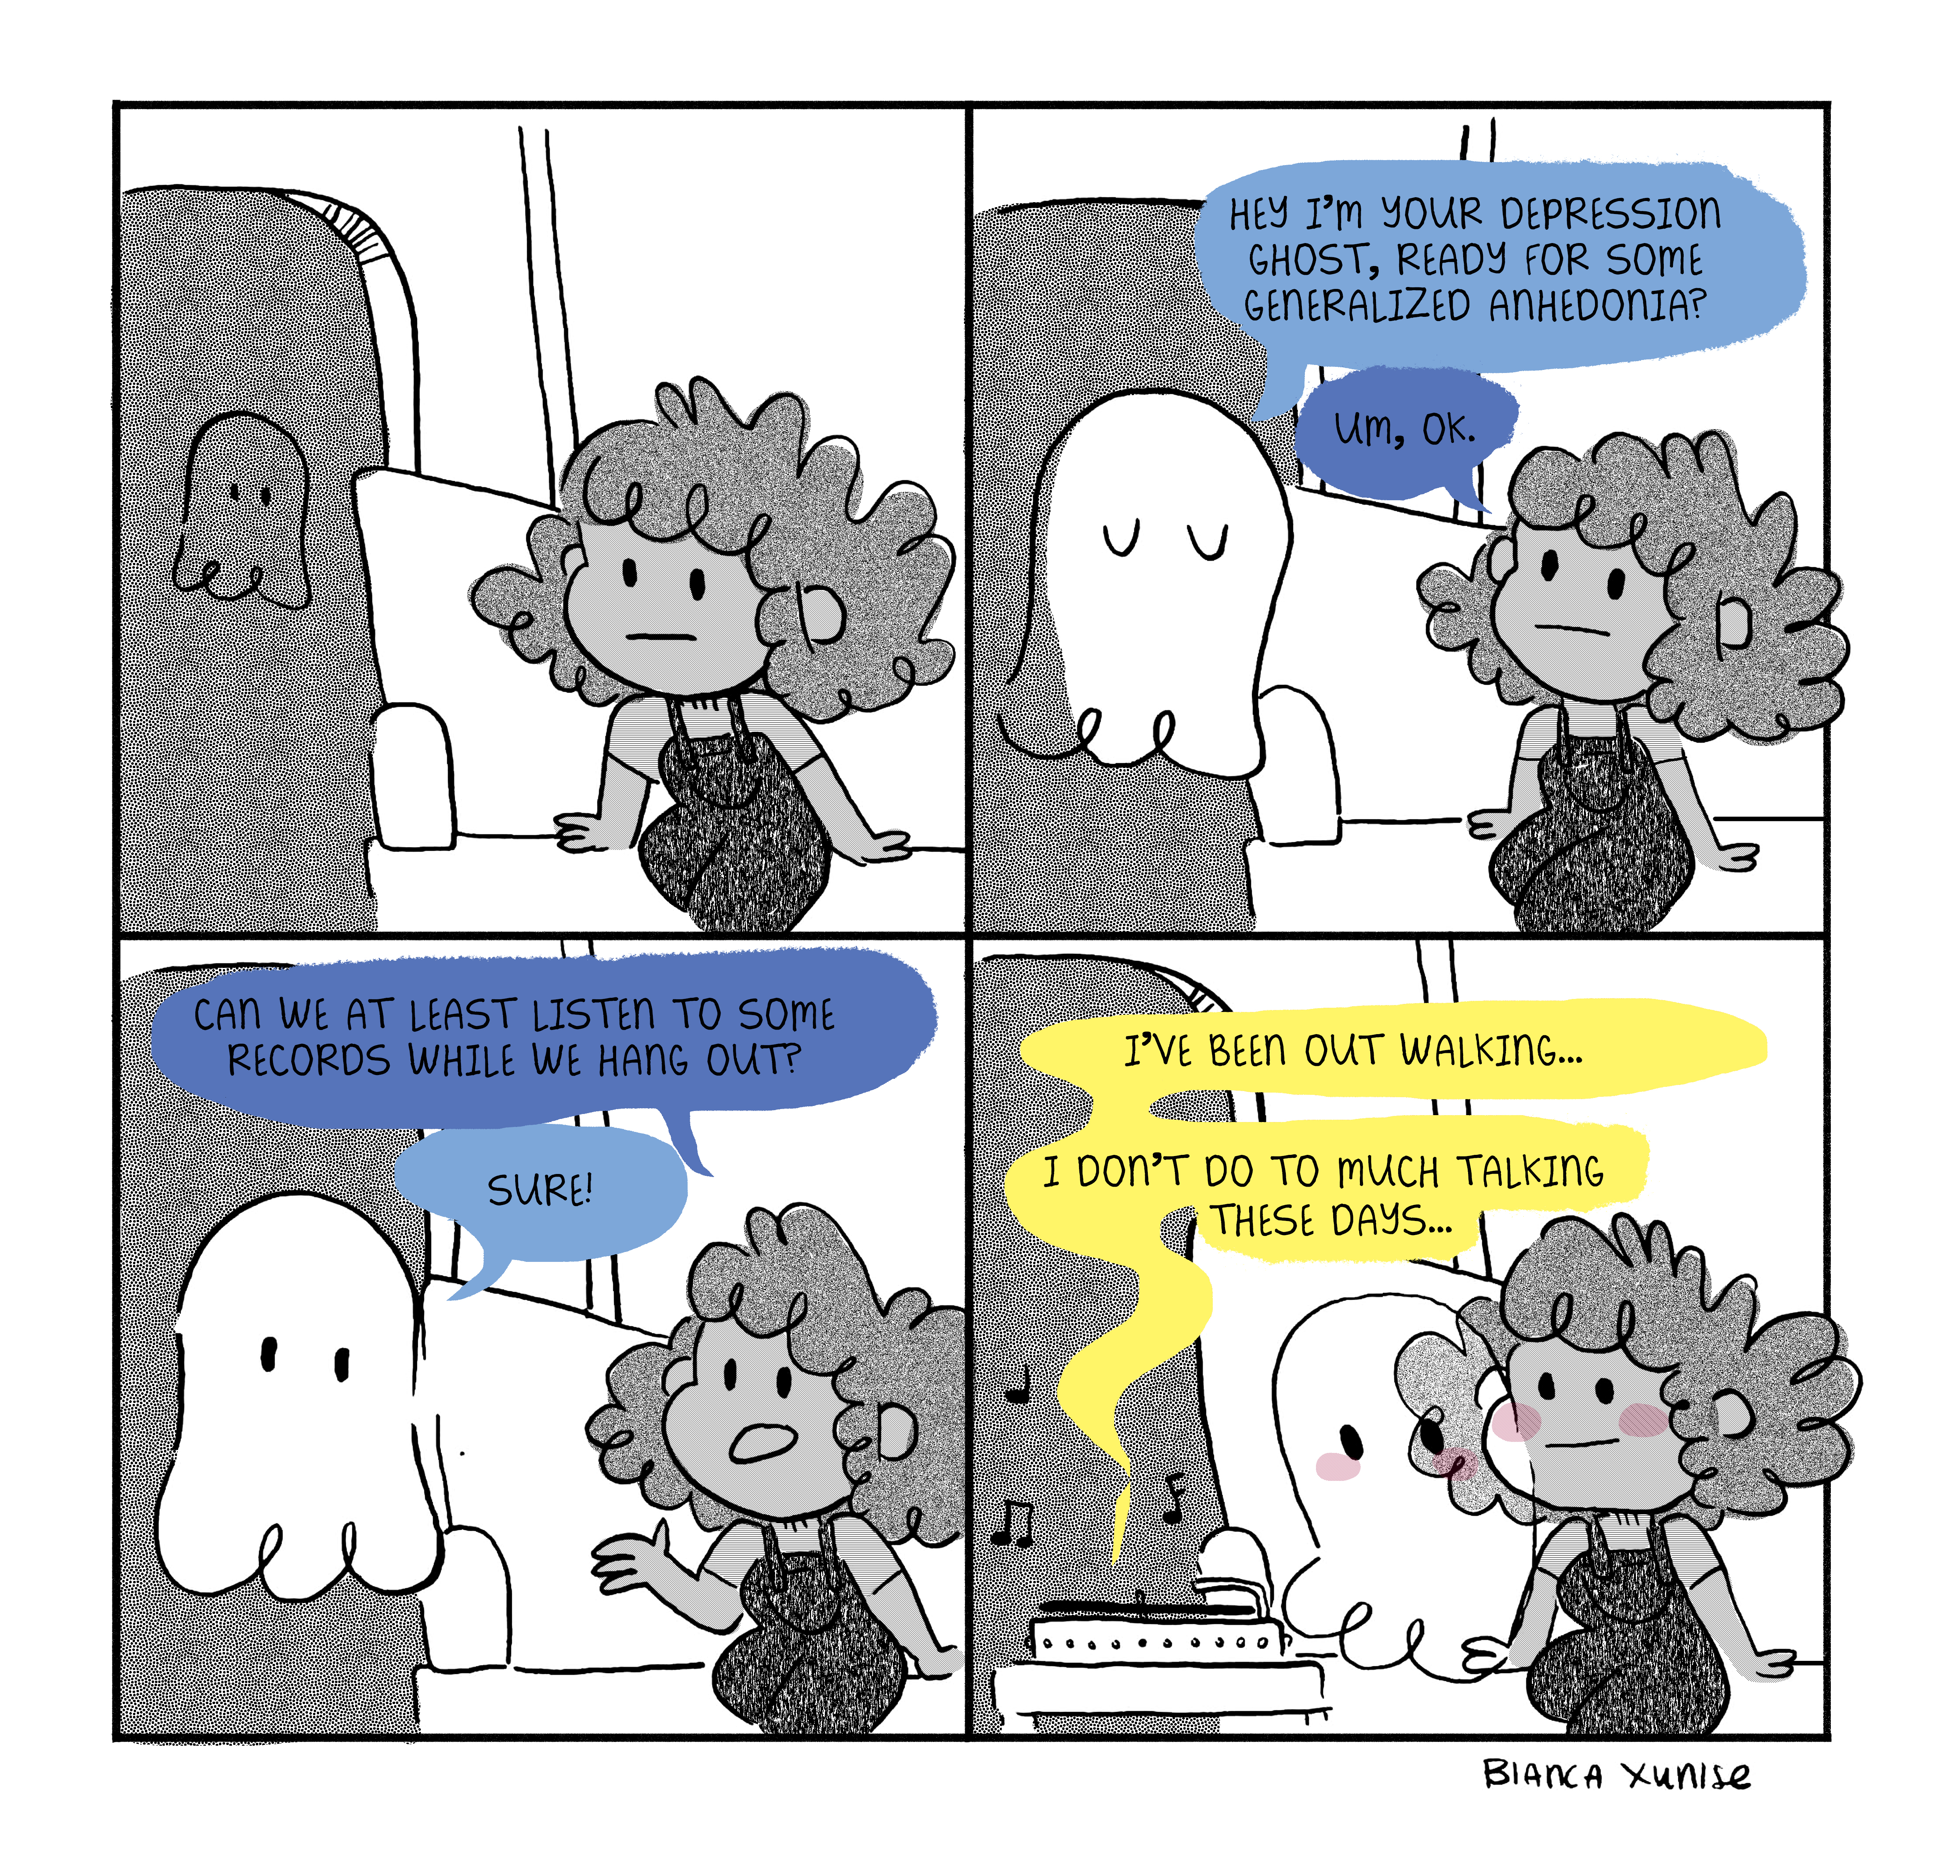 Depression Ghost